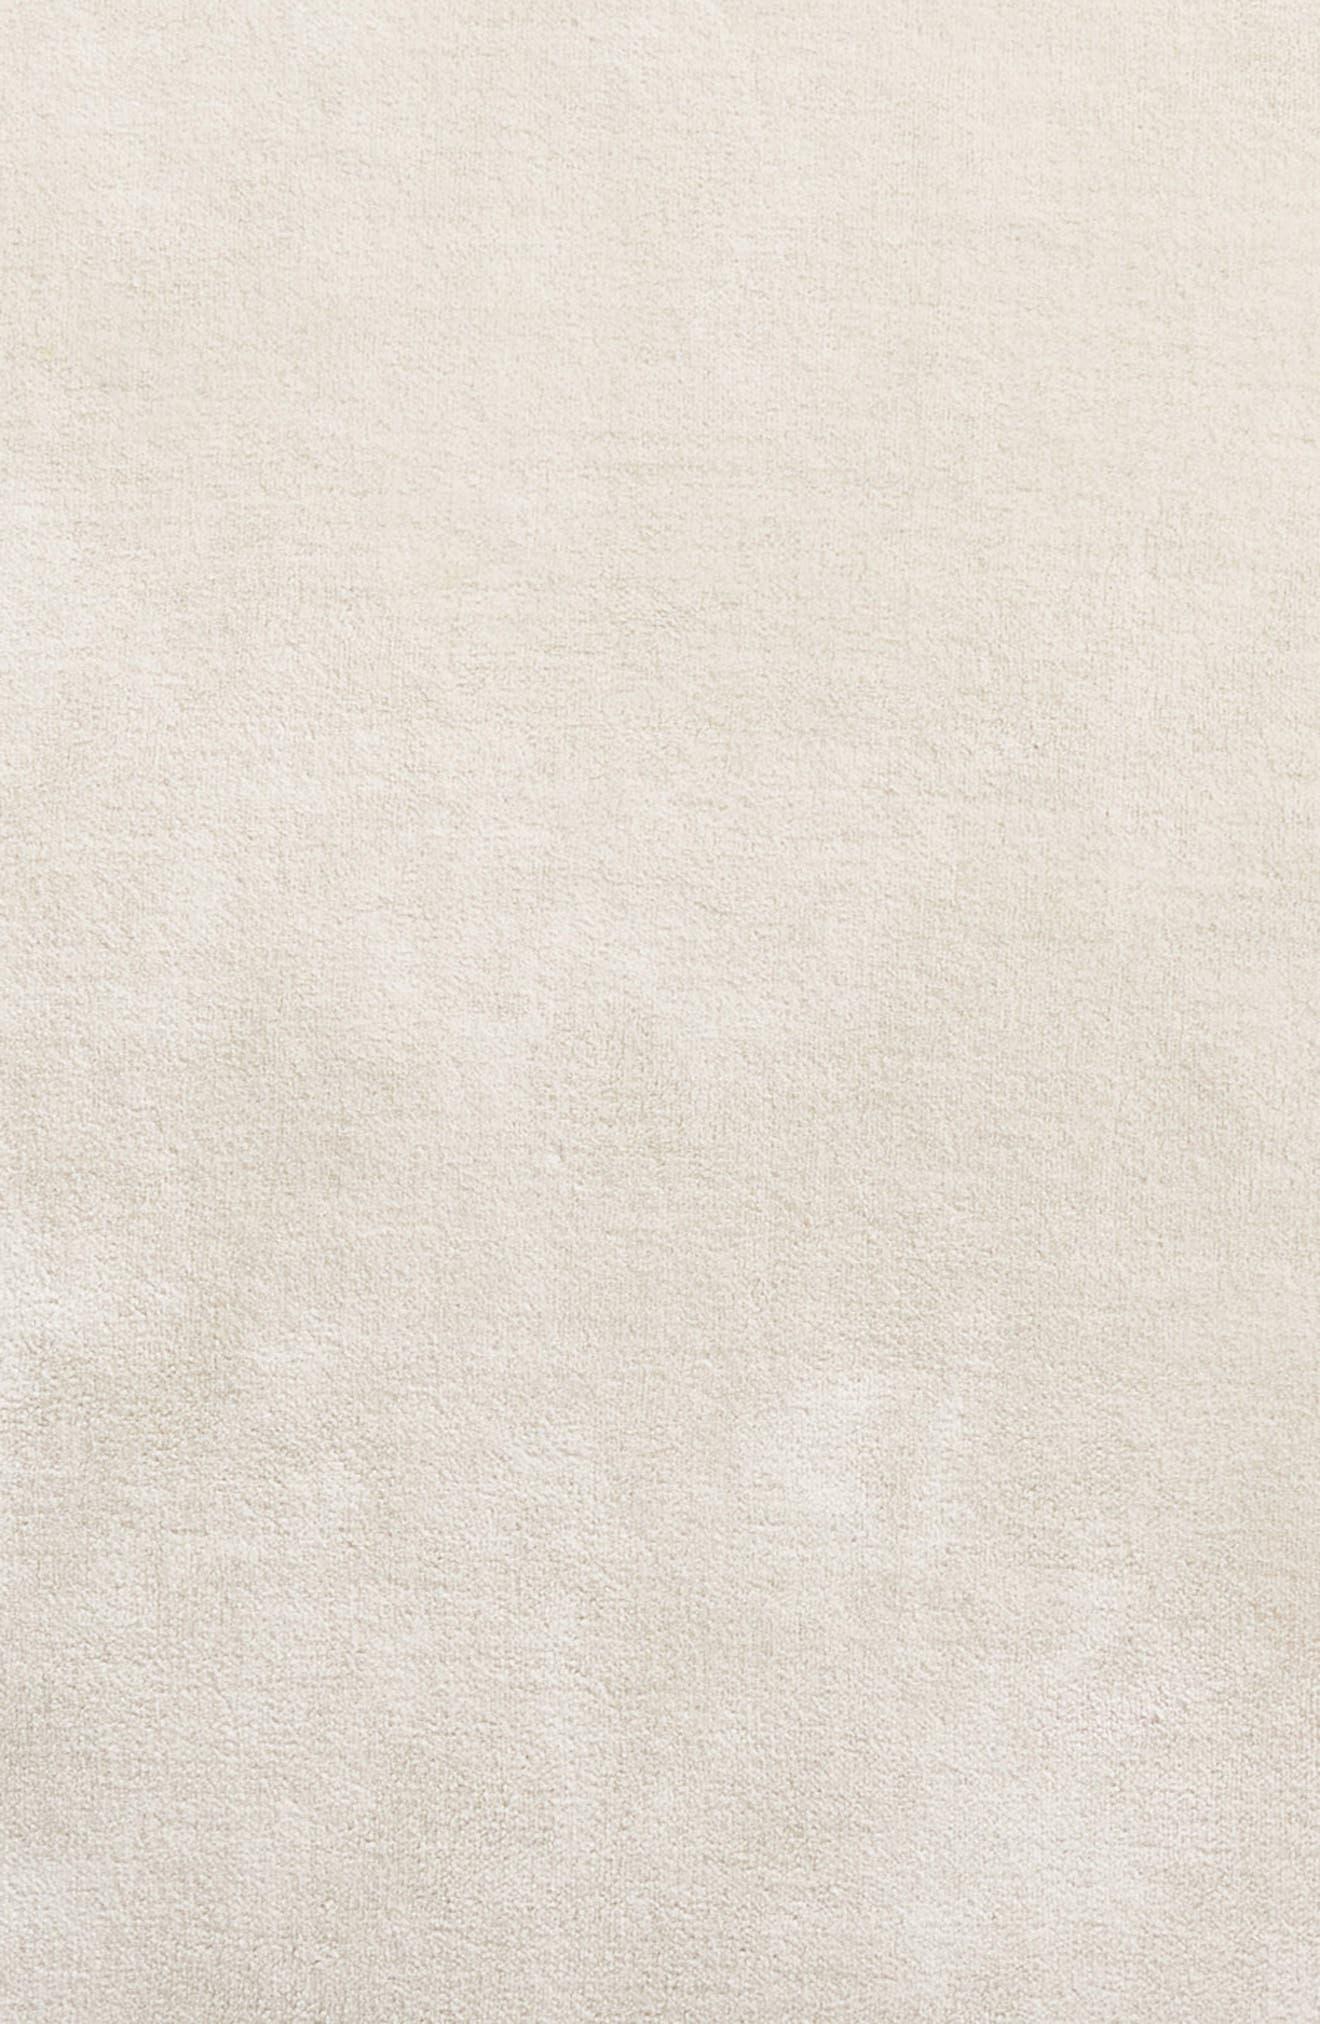 Stonewash Velvet Accent Pillow,                             Alternate thumbnail 4, color,                             Grey Chime